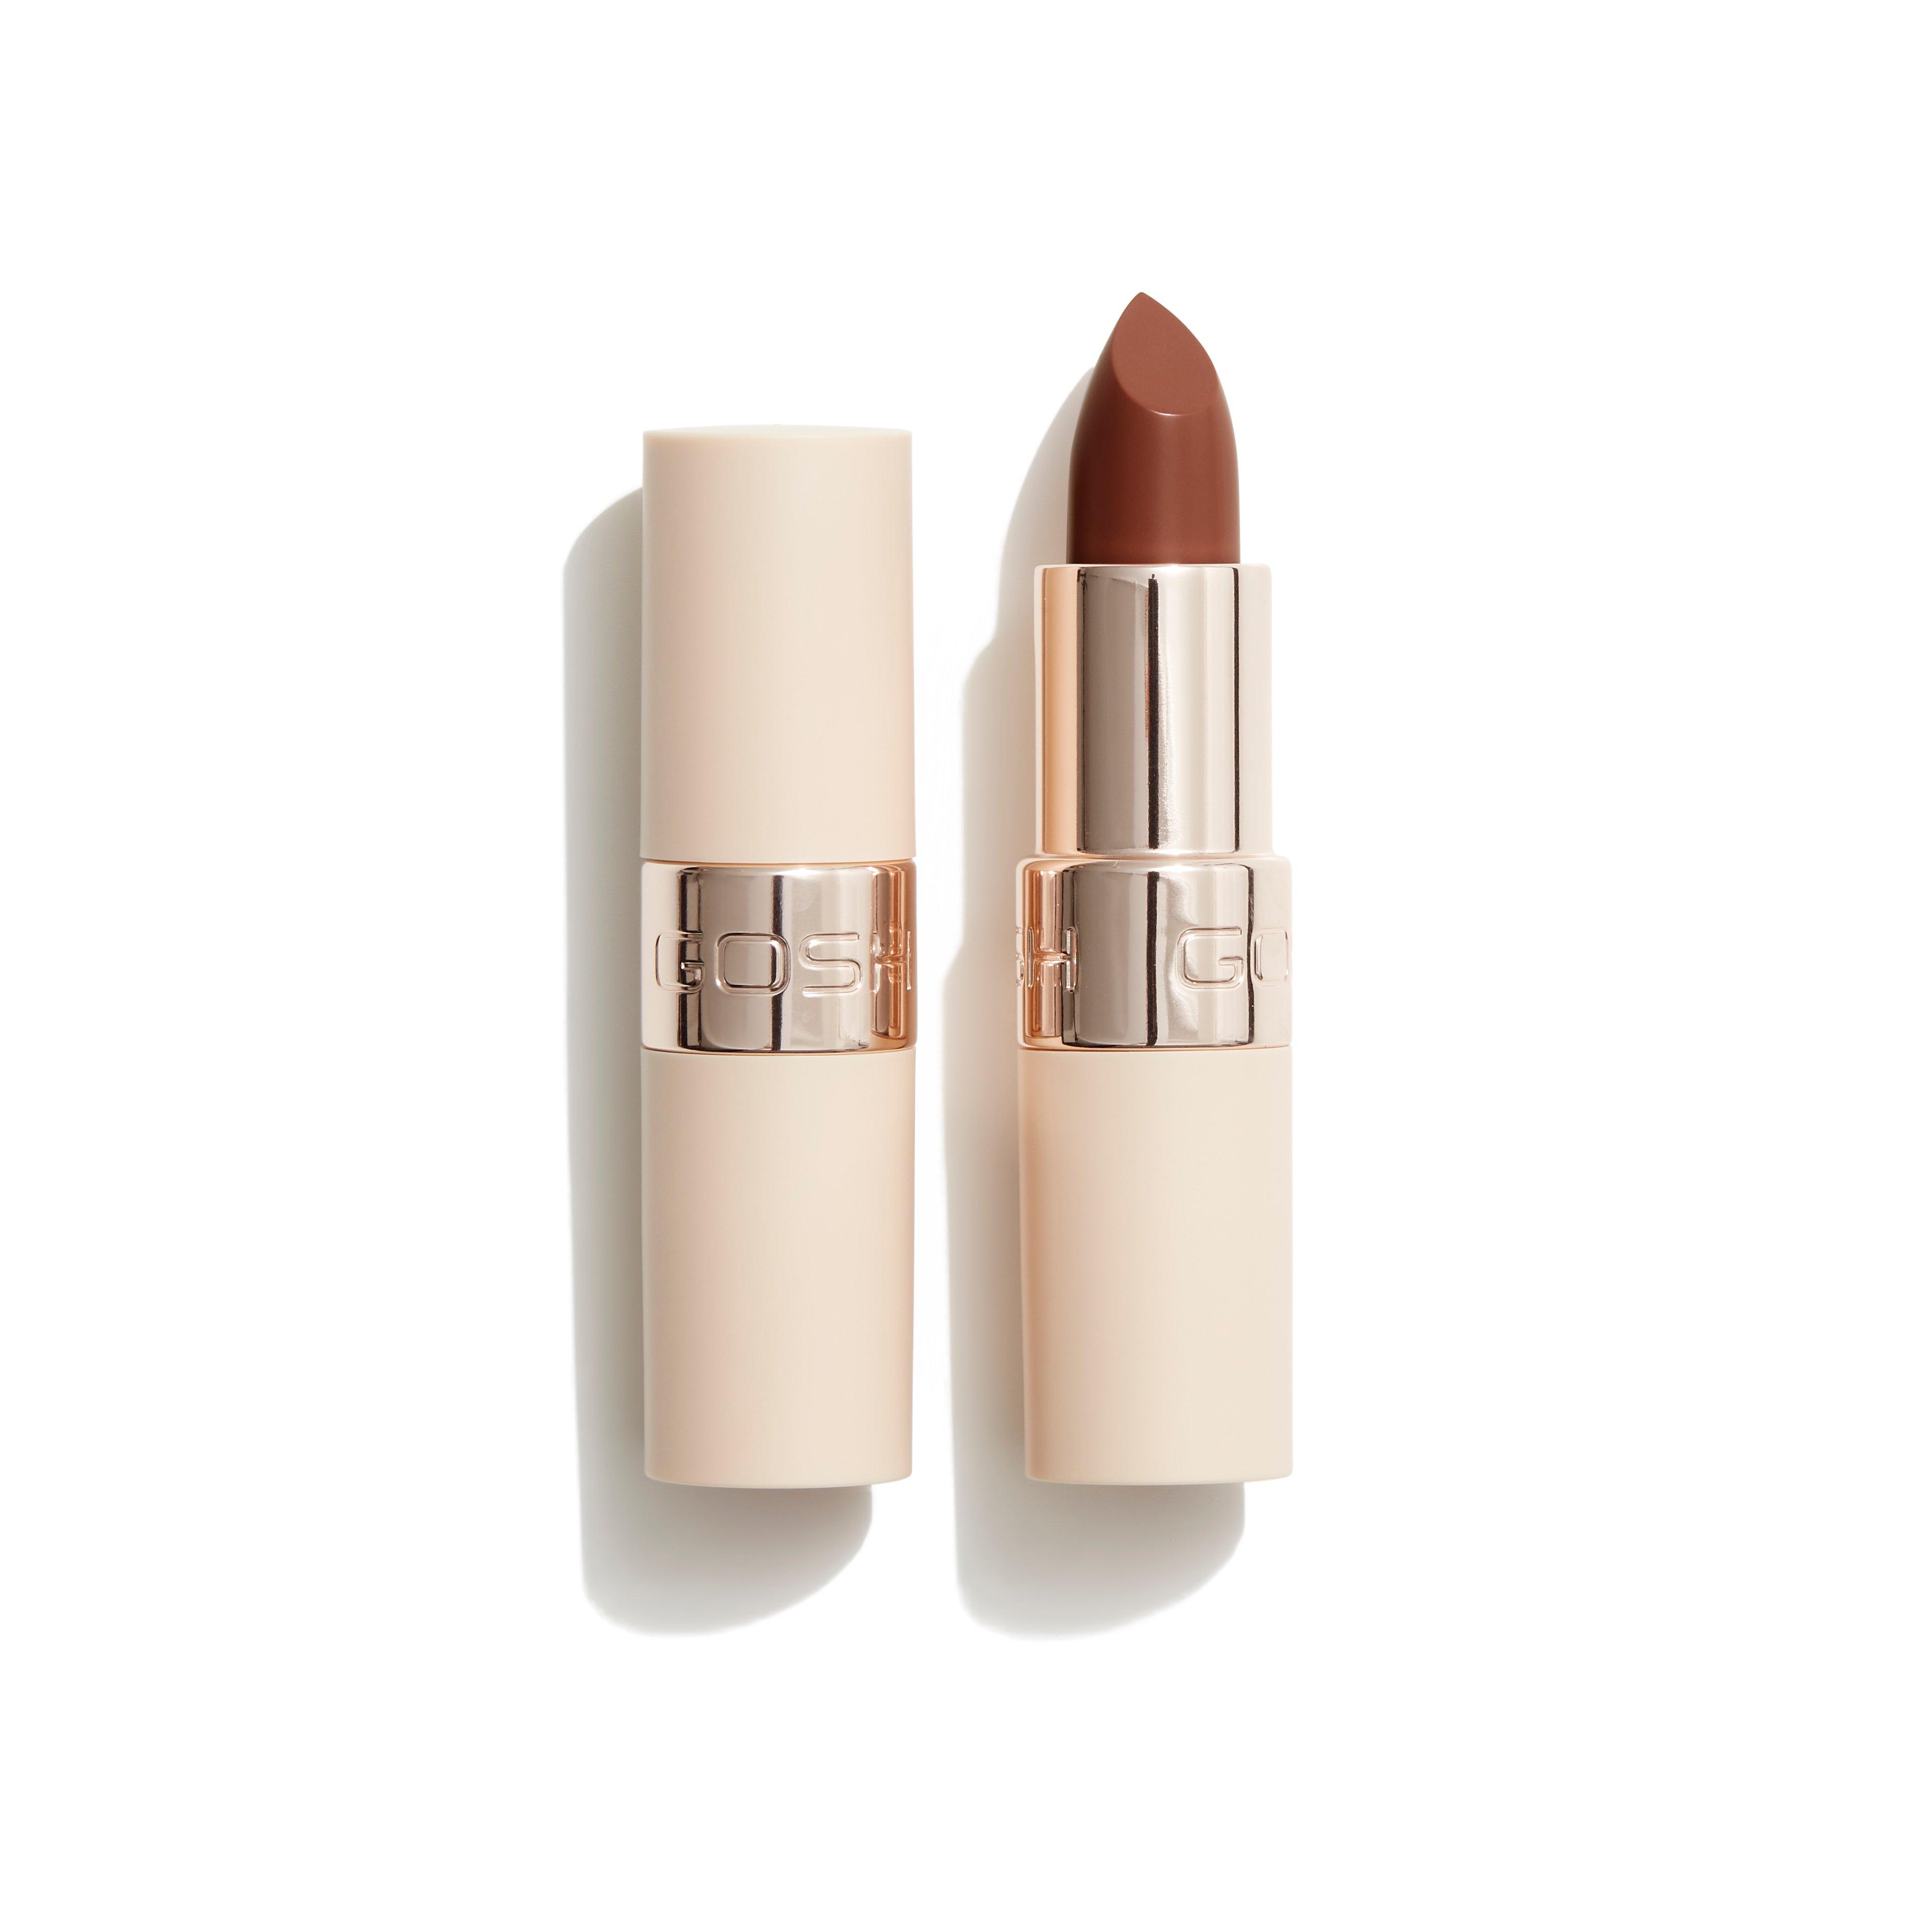 GOSH Copenhagen - Luxury Nude Lips - 004 Exposed